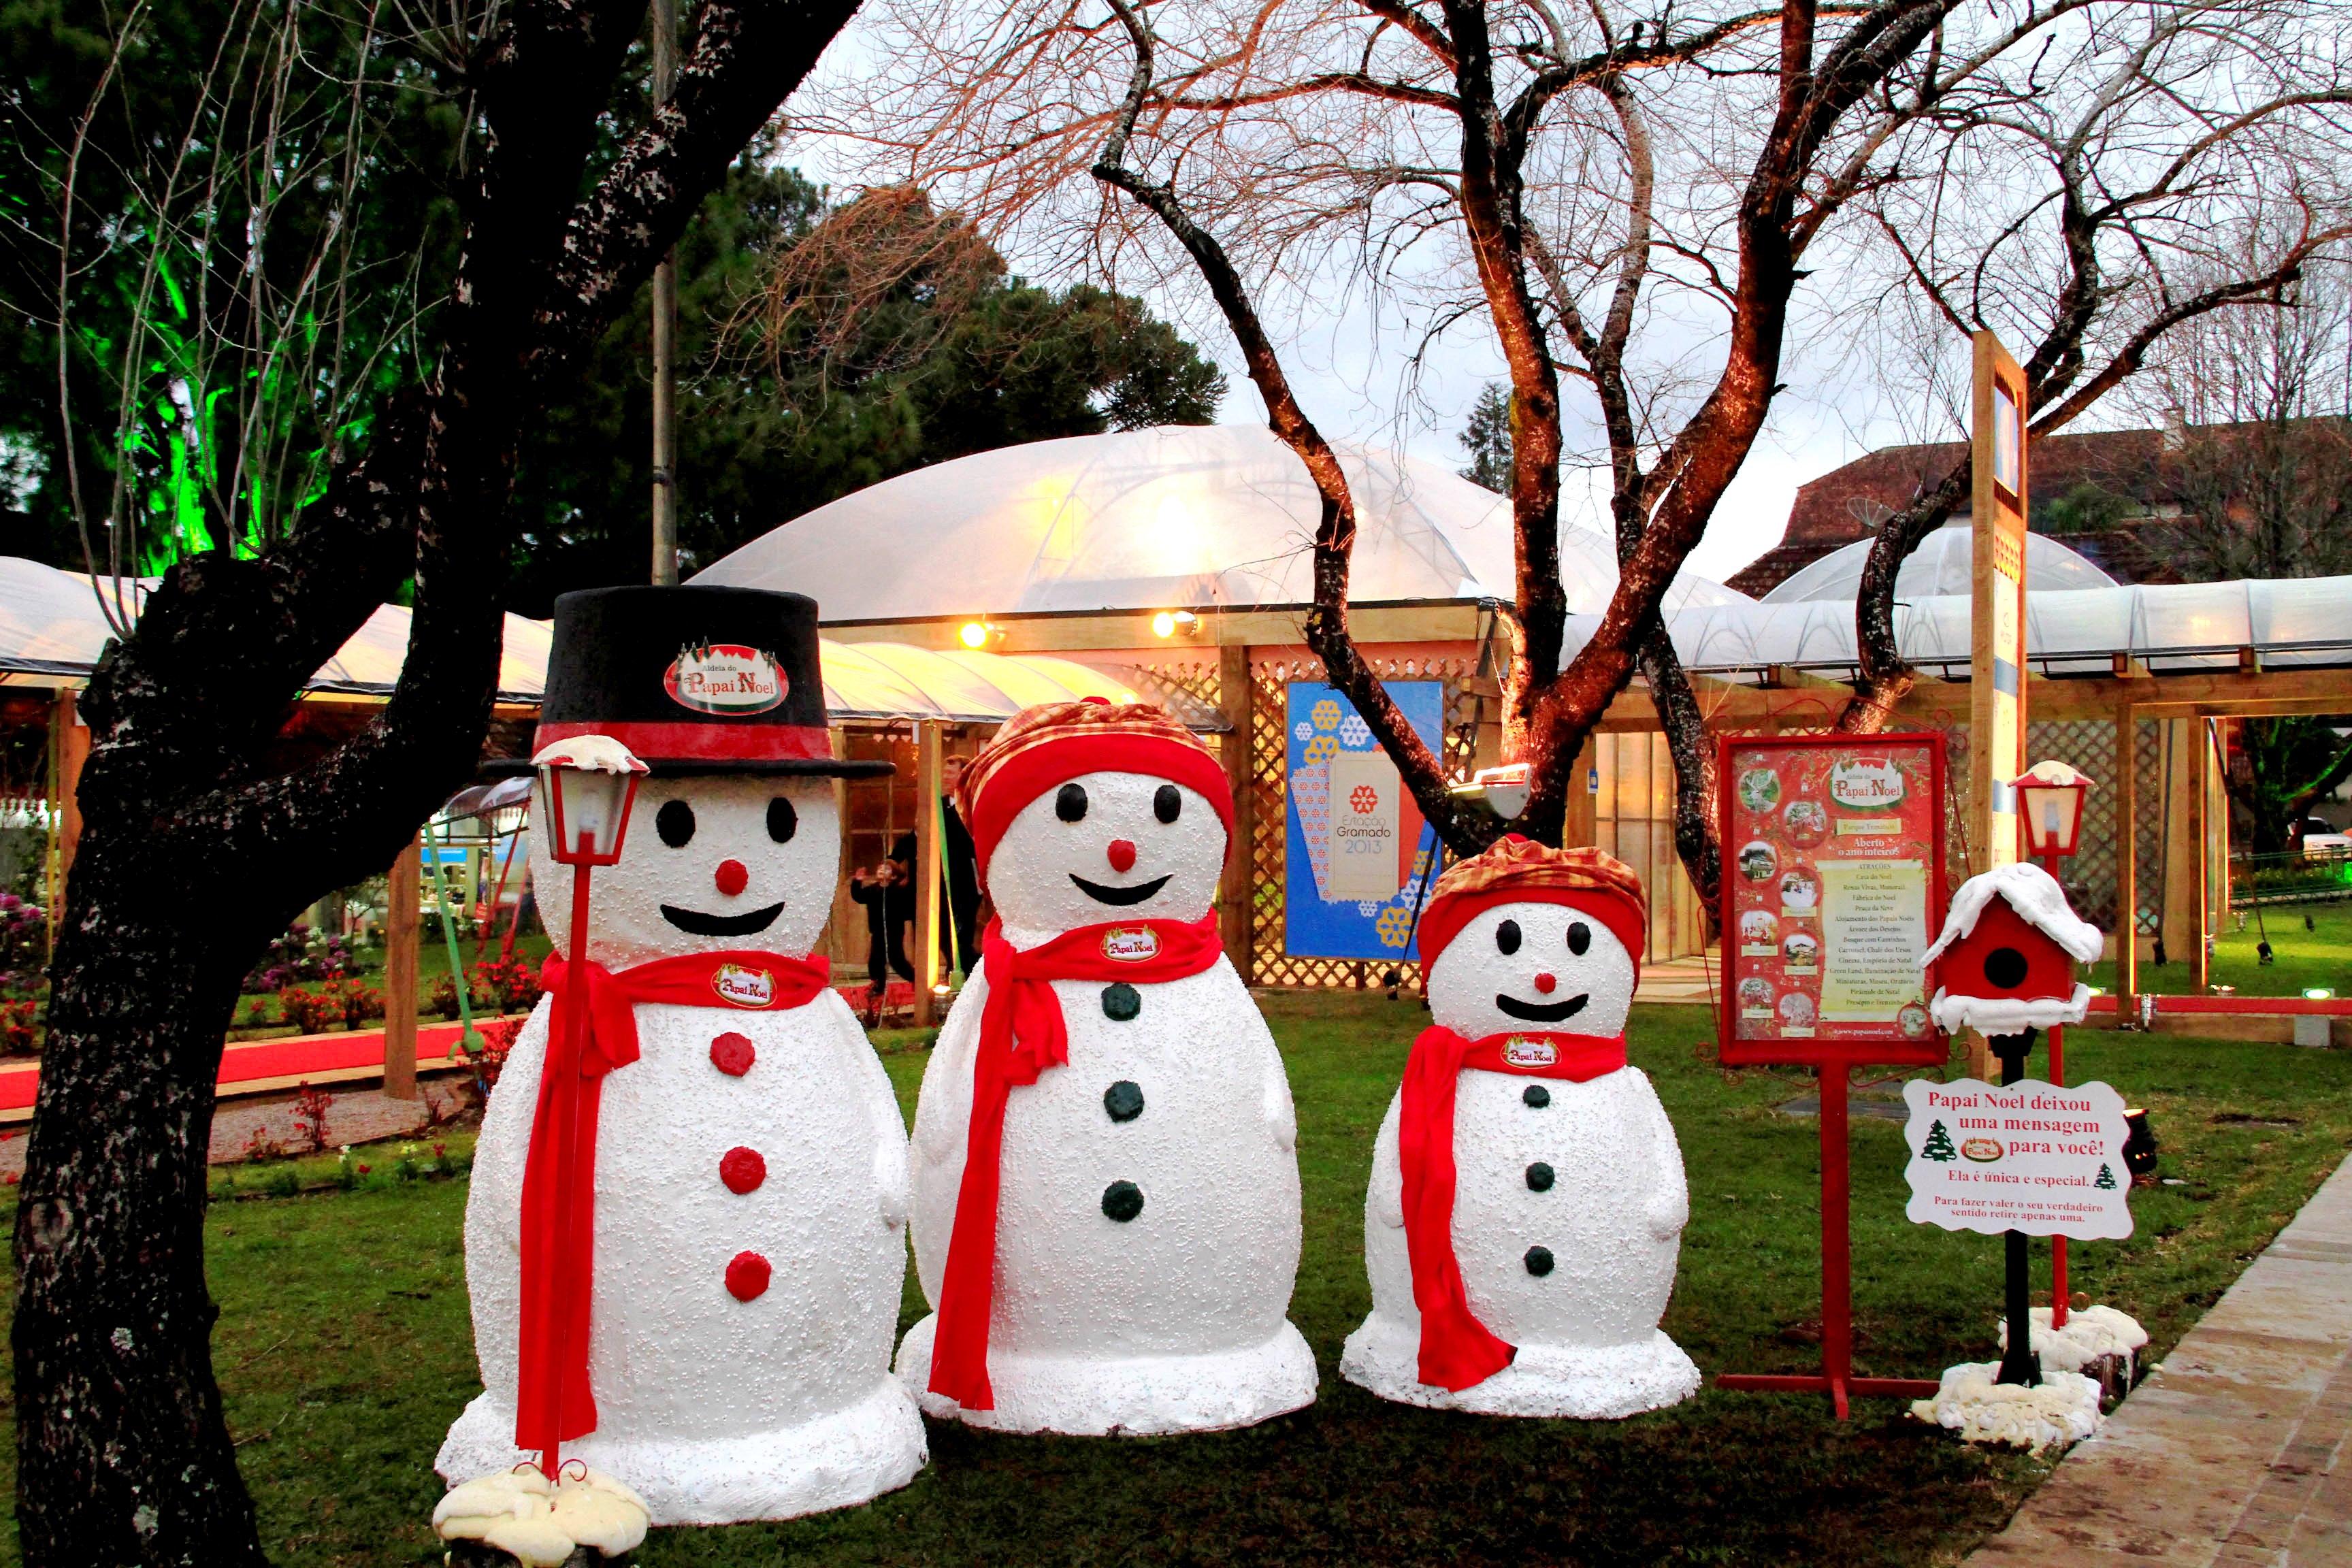 A Rena Mais Famosa Do Papai Noel aldeia do papai noel - chapinha na mala